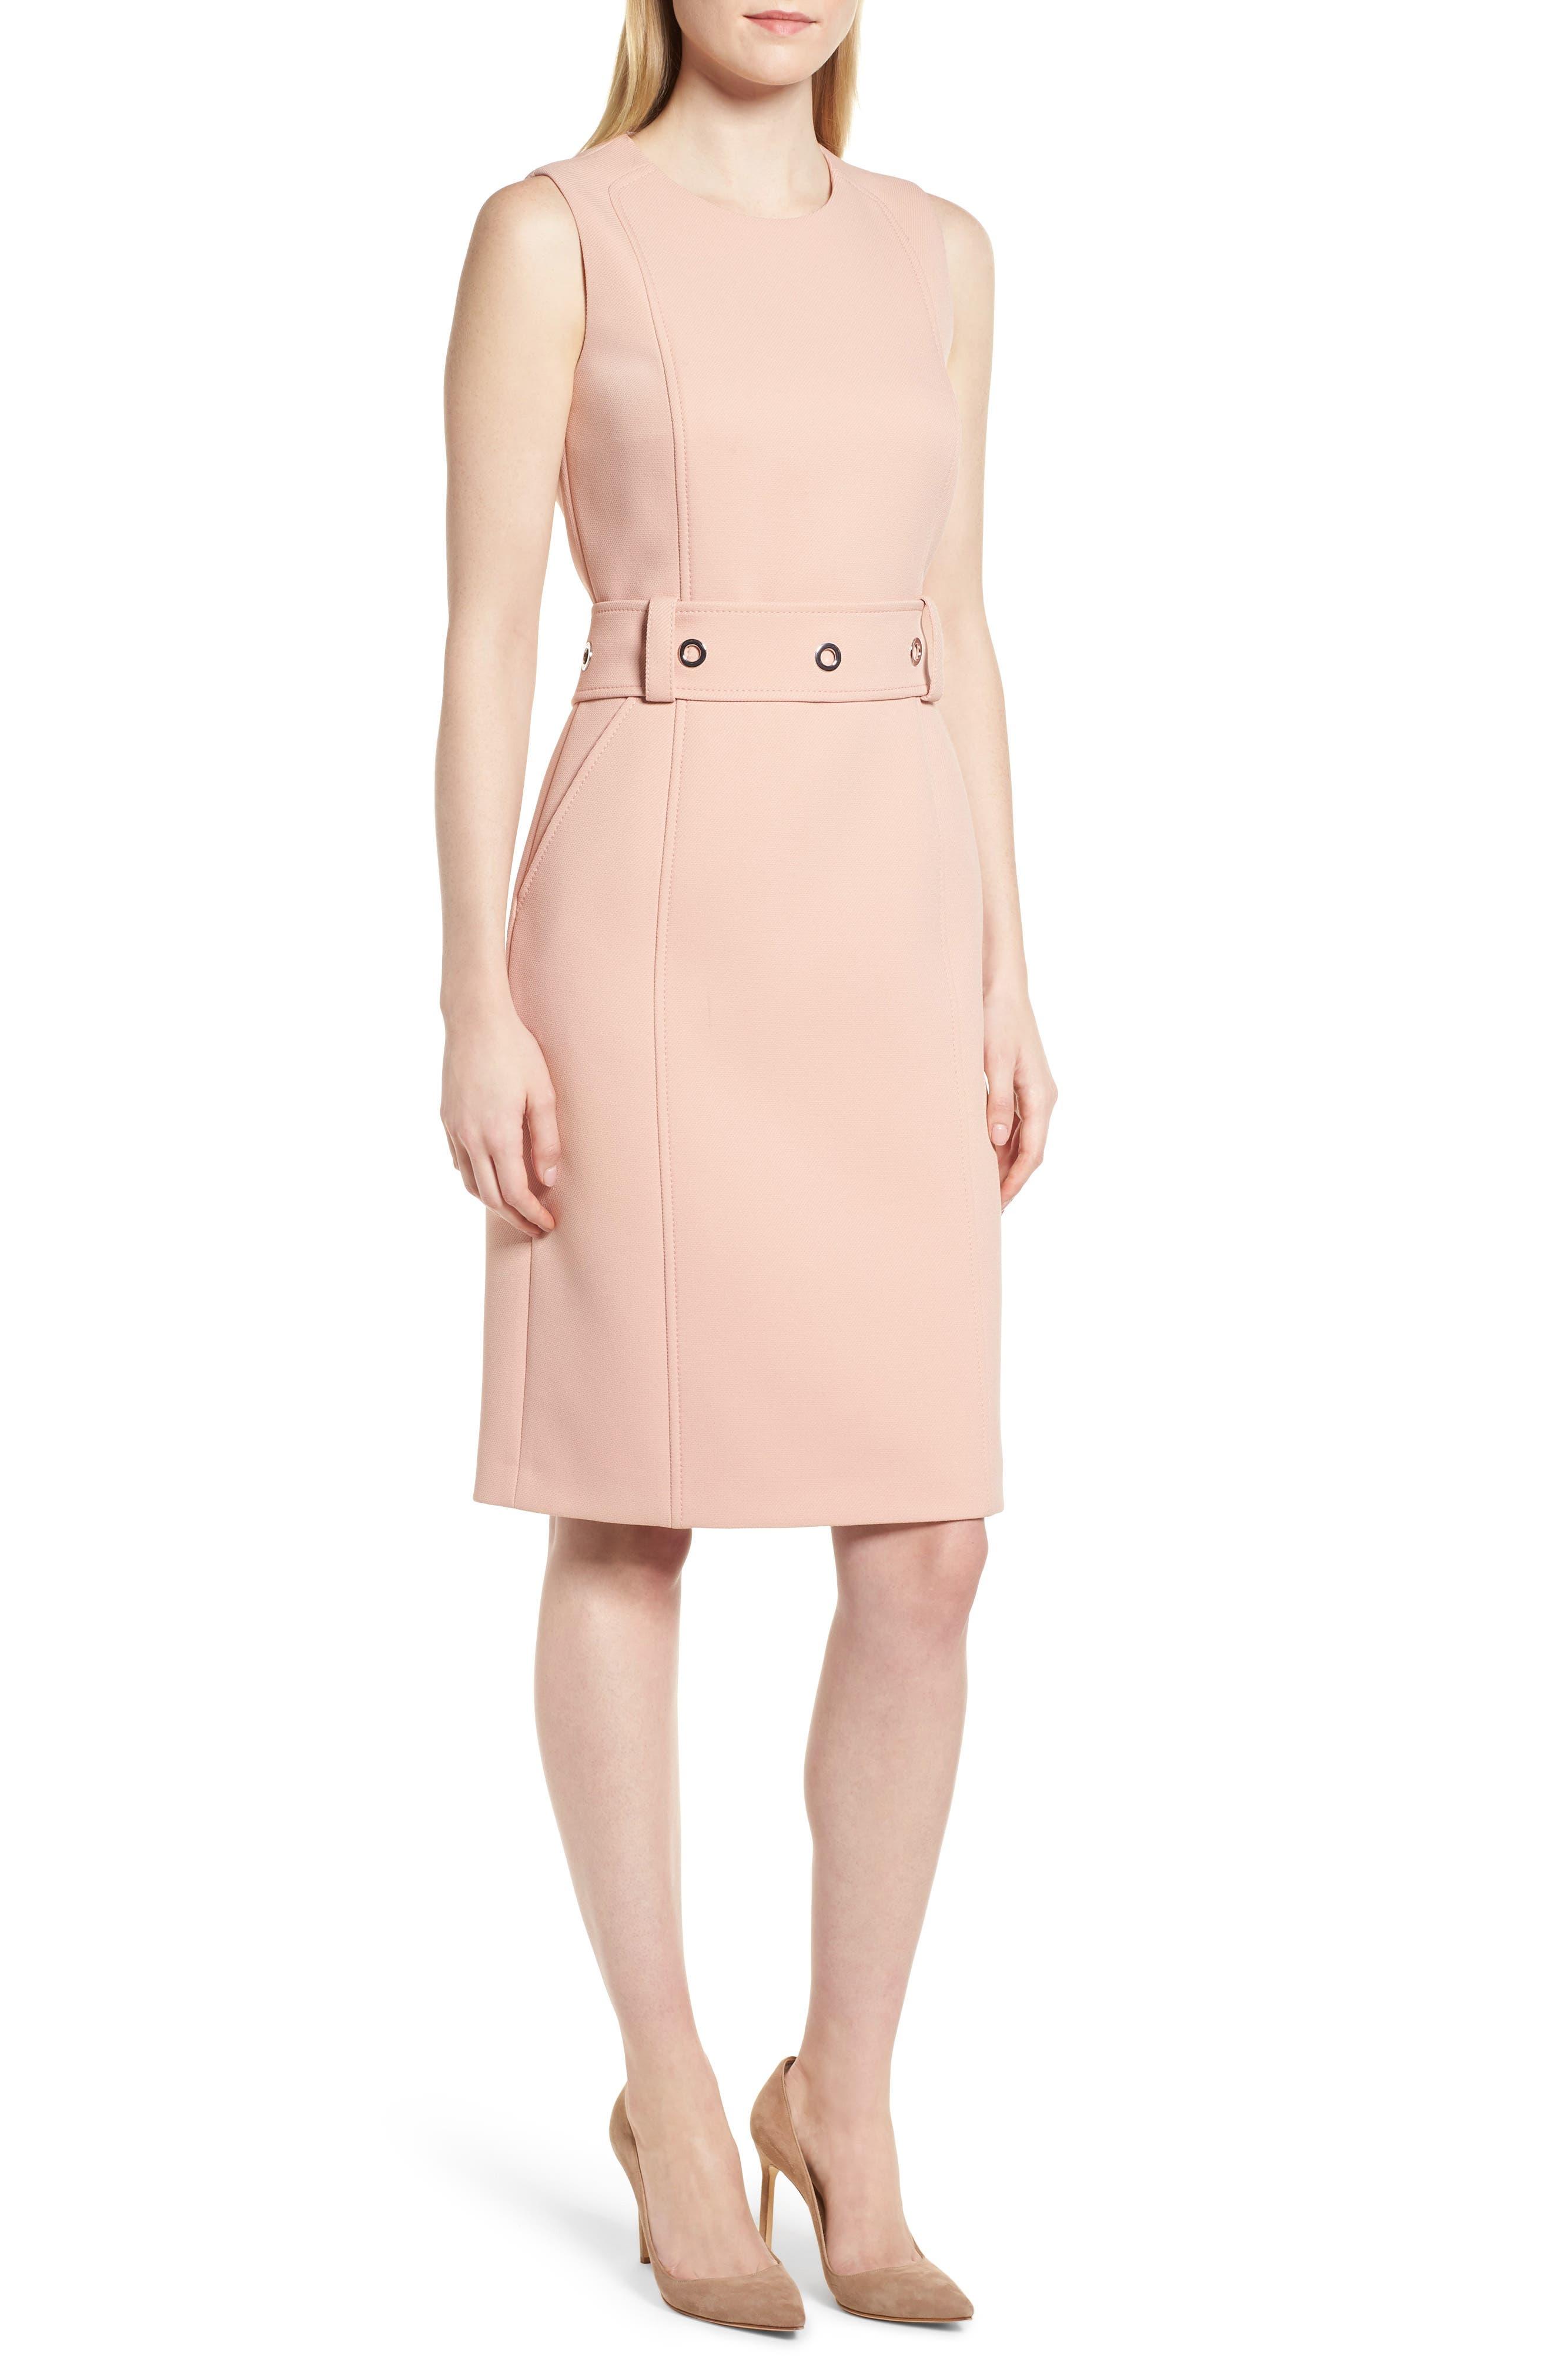 Duleama Compact Twill Dress,                             Main thumbnail 1, color,                             Blush